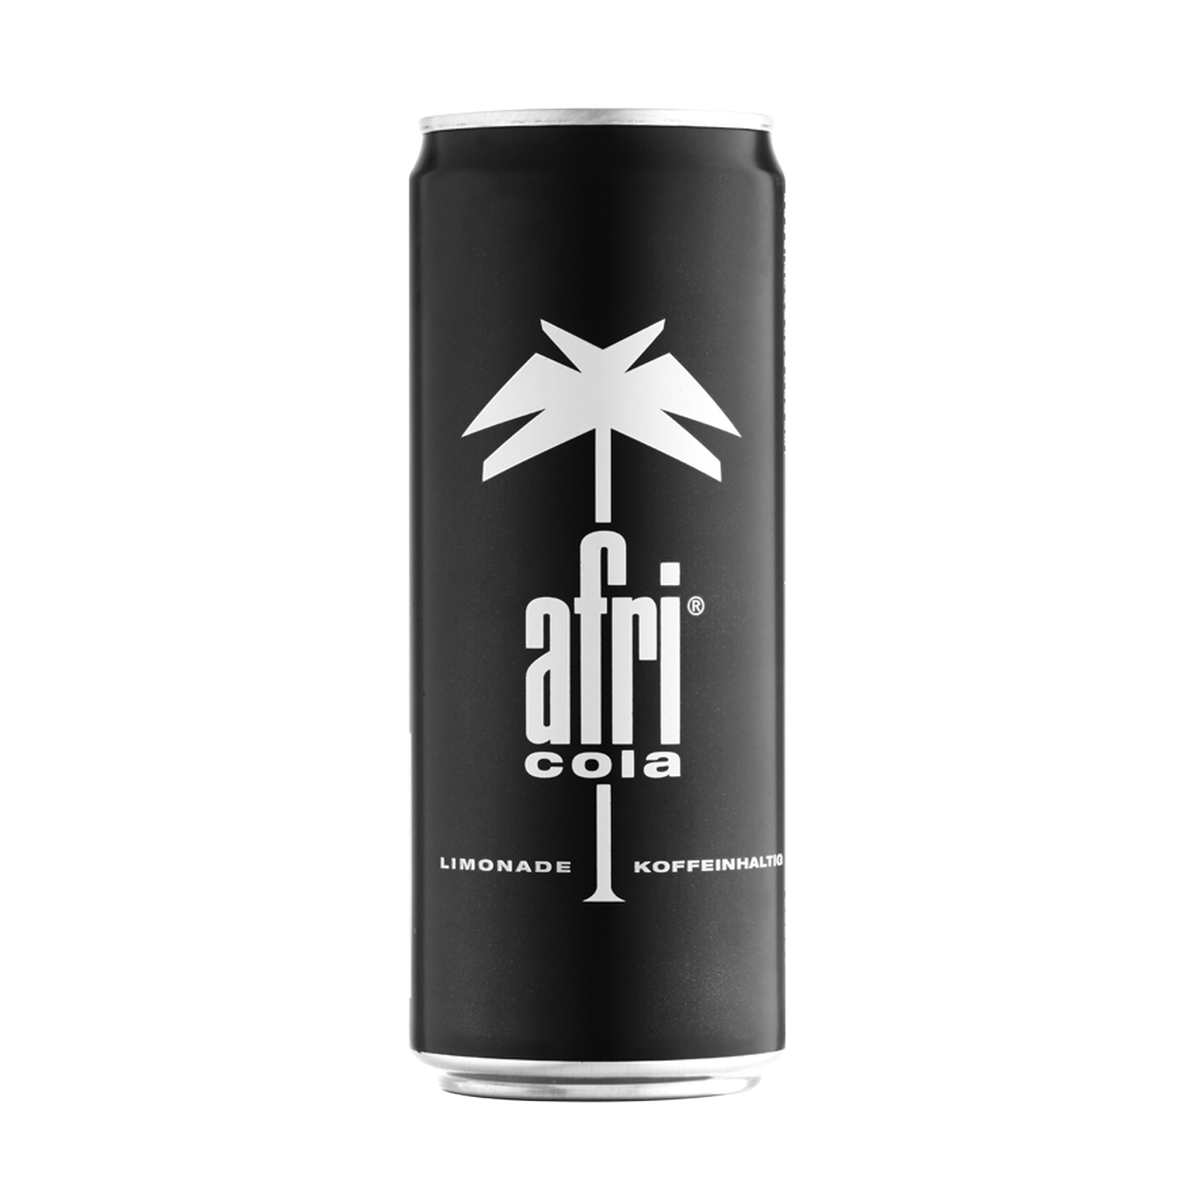 Afri Cola 0,33L | Cola, Limonaden & Co | Alkoholfreie Getränke ...